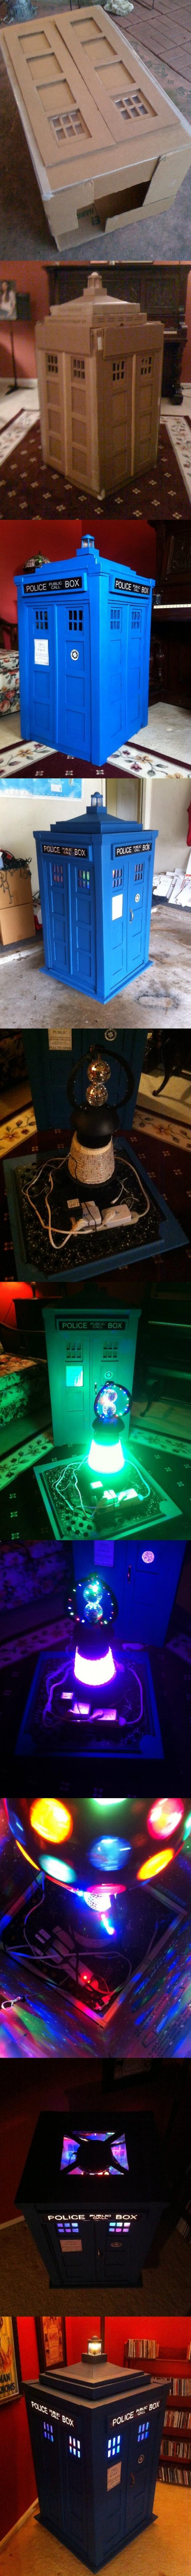 tardis jukebox3